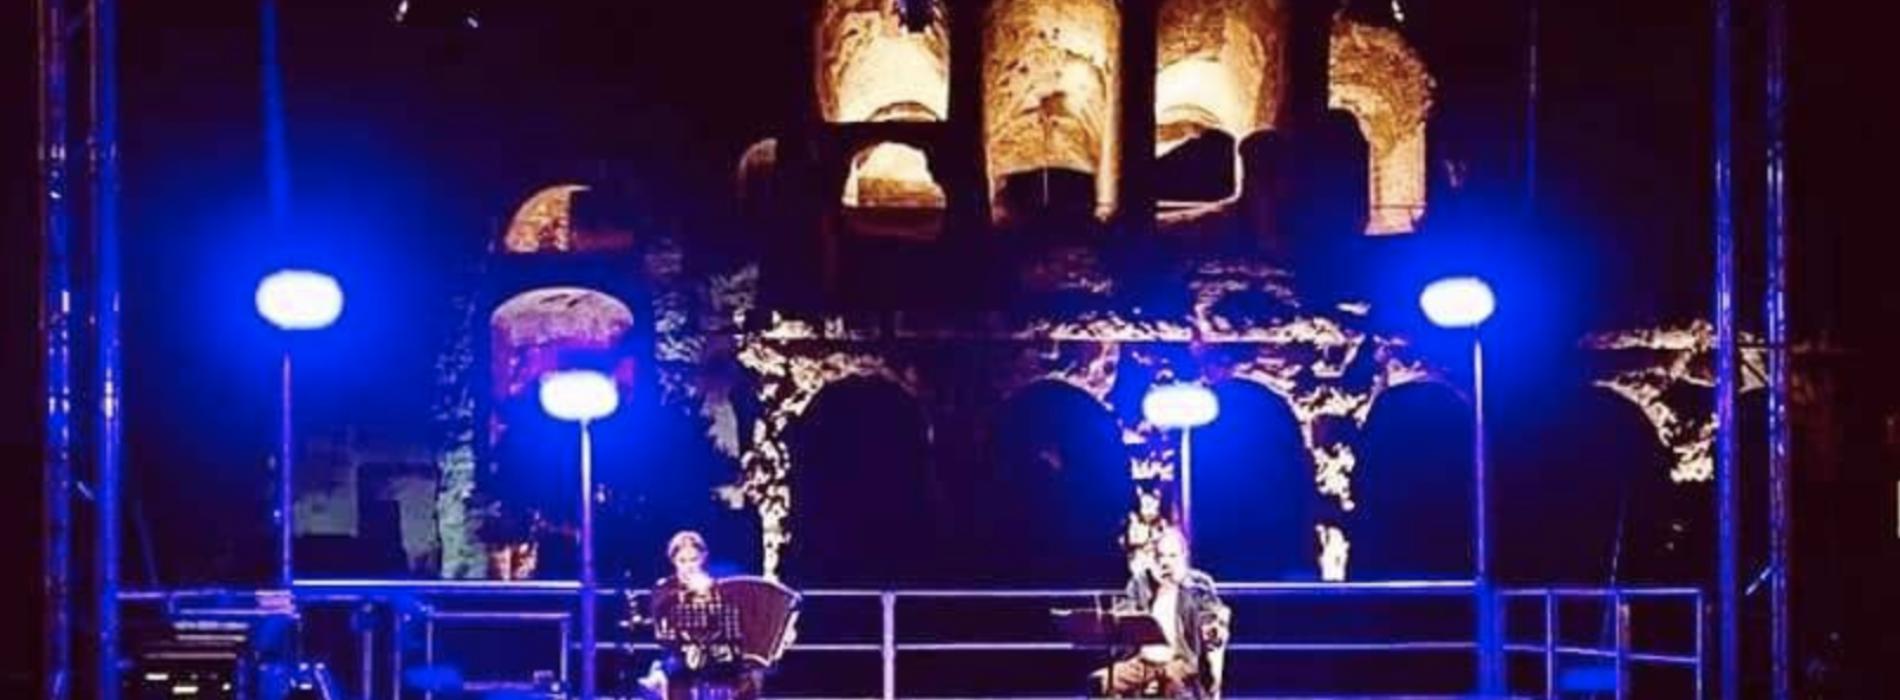 Spartacus Festival. Notte sotto le stelle con Lello Petrarca